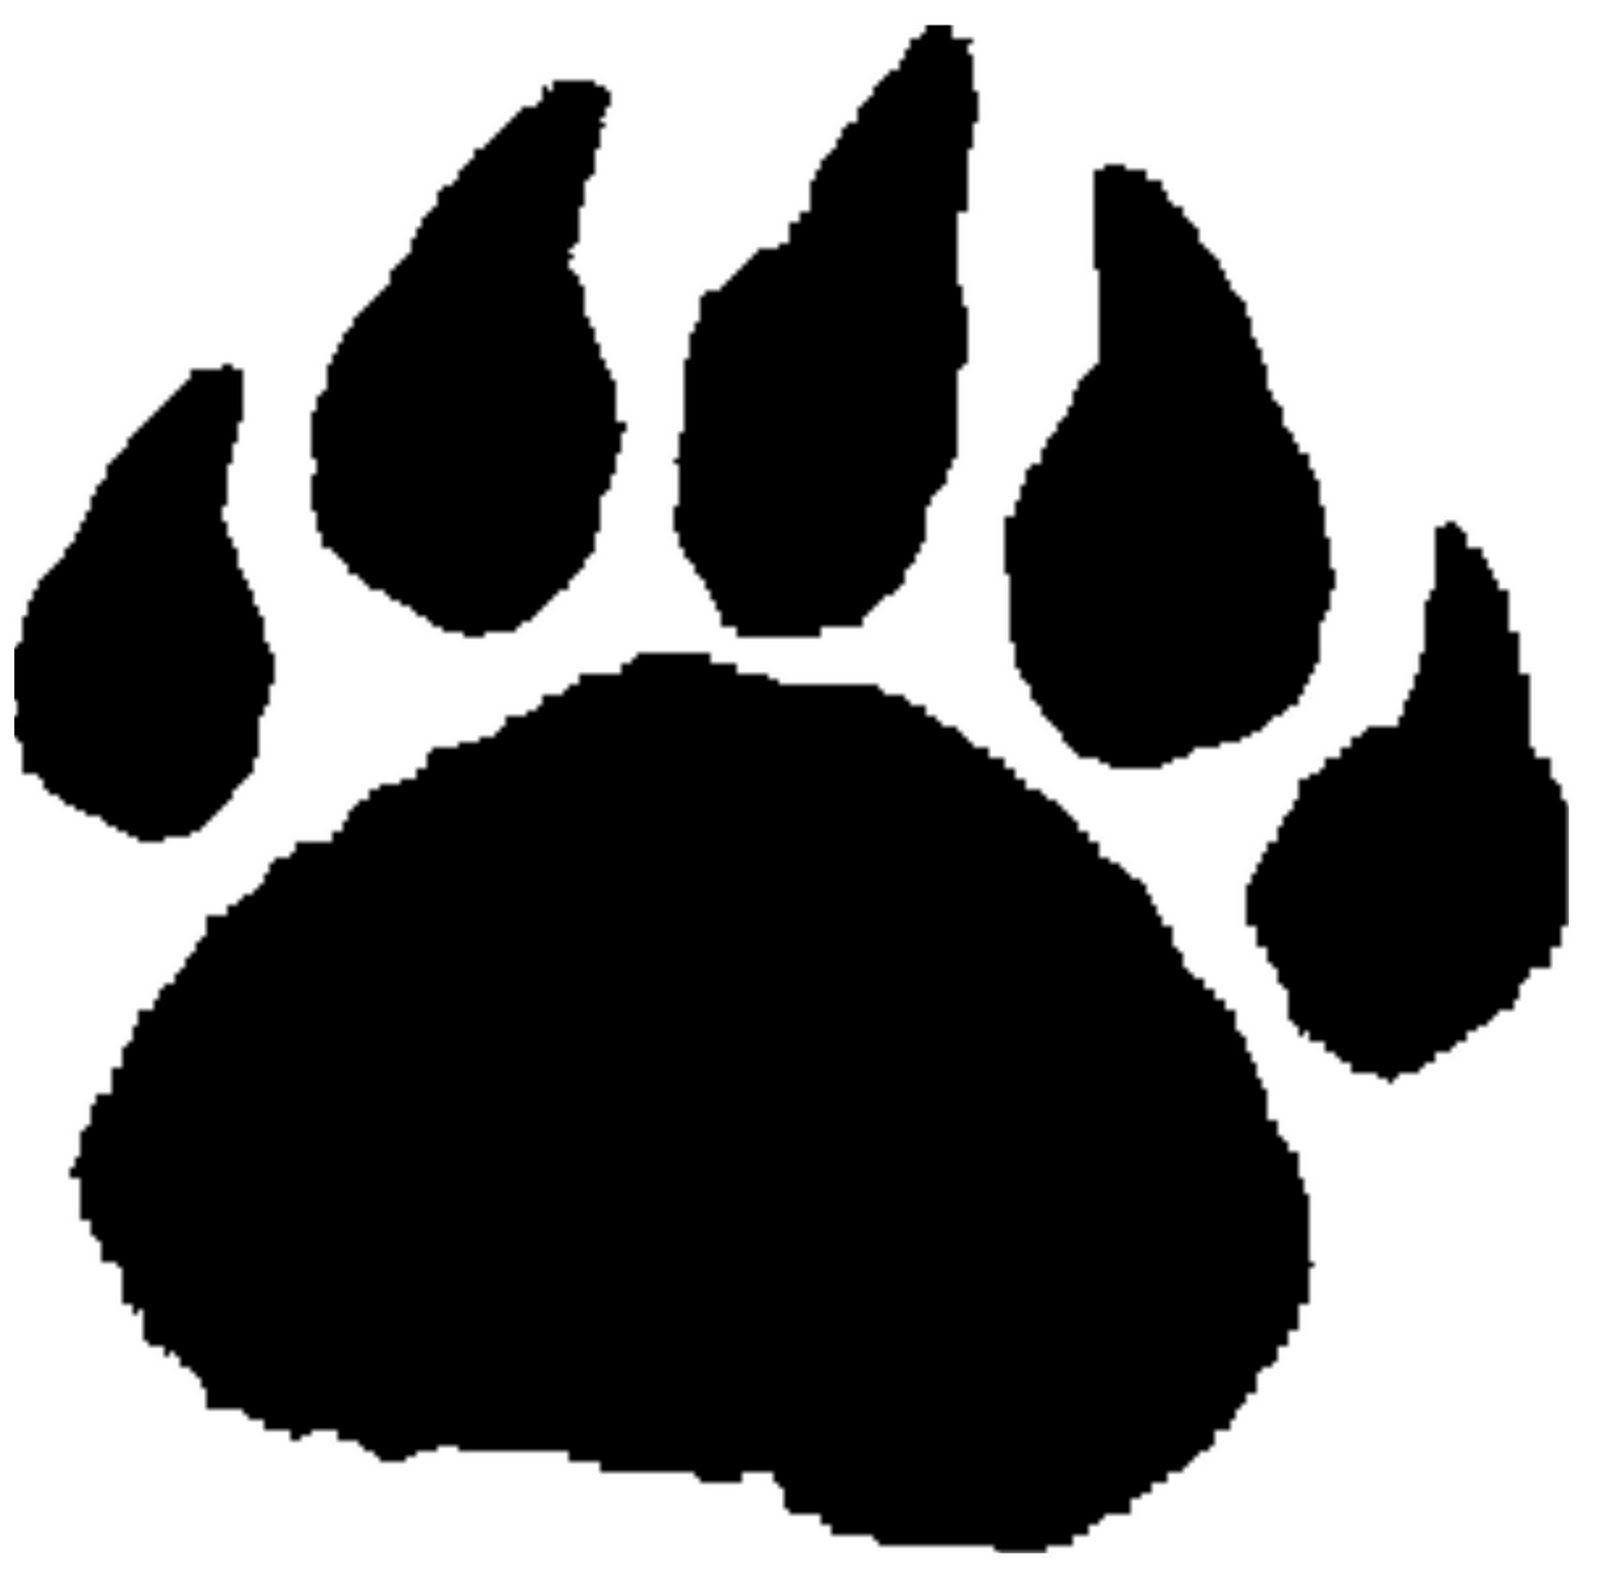 Grizzly Bear Paw Print Clipart 4ibkXK5igjpeg 1600x1576